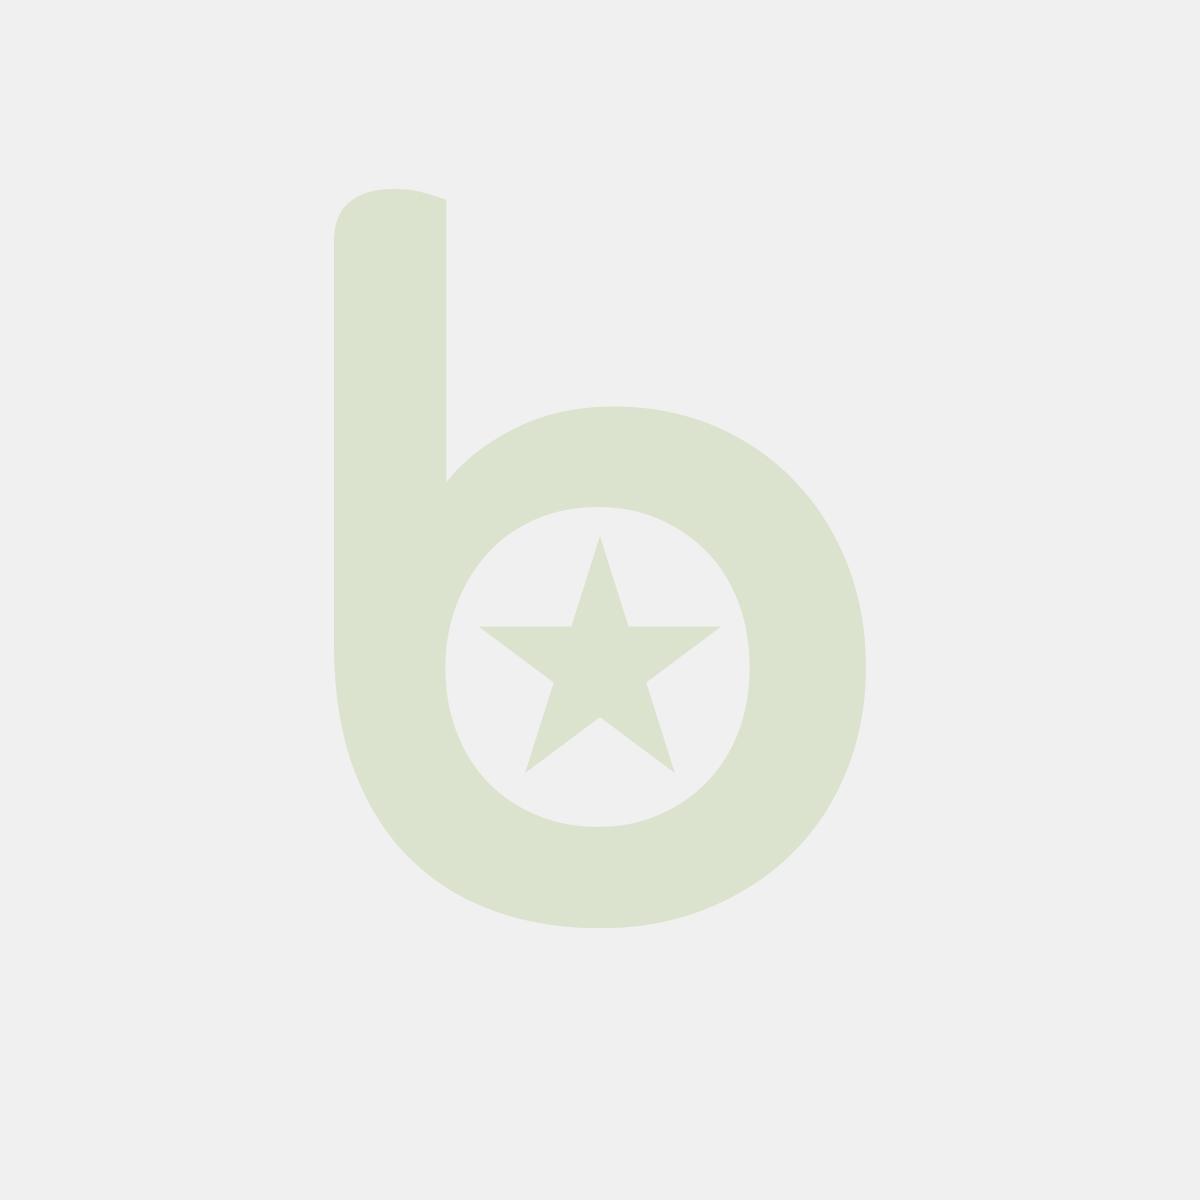 Waga biurowa na listy Optimo 2000 do 2 kg 90127